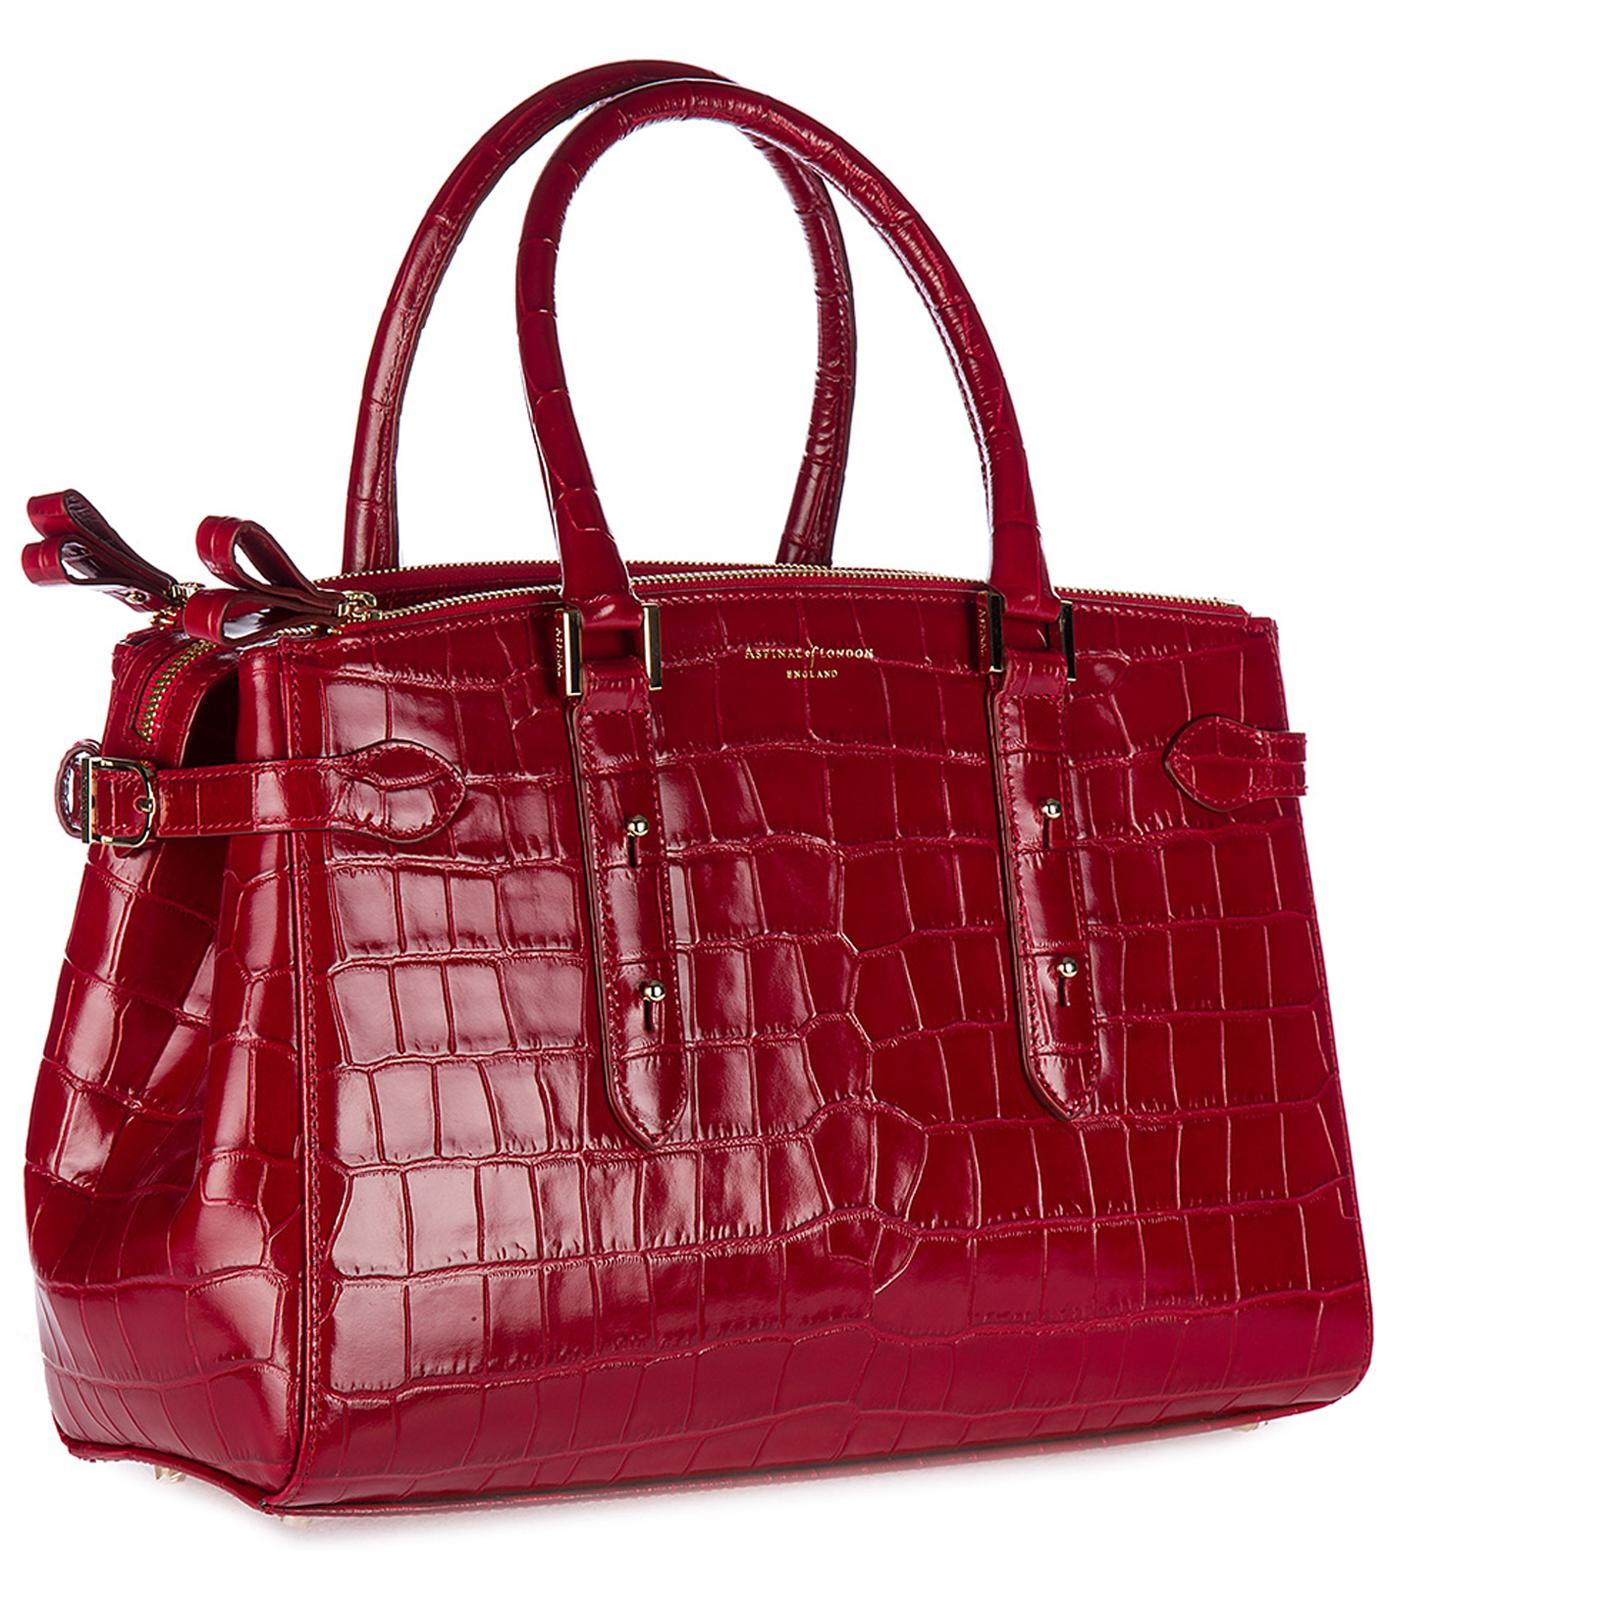 Women's leather handbag shopping bag purse brook street